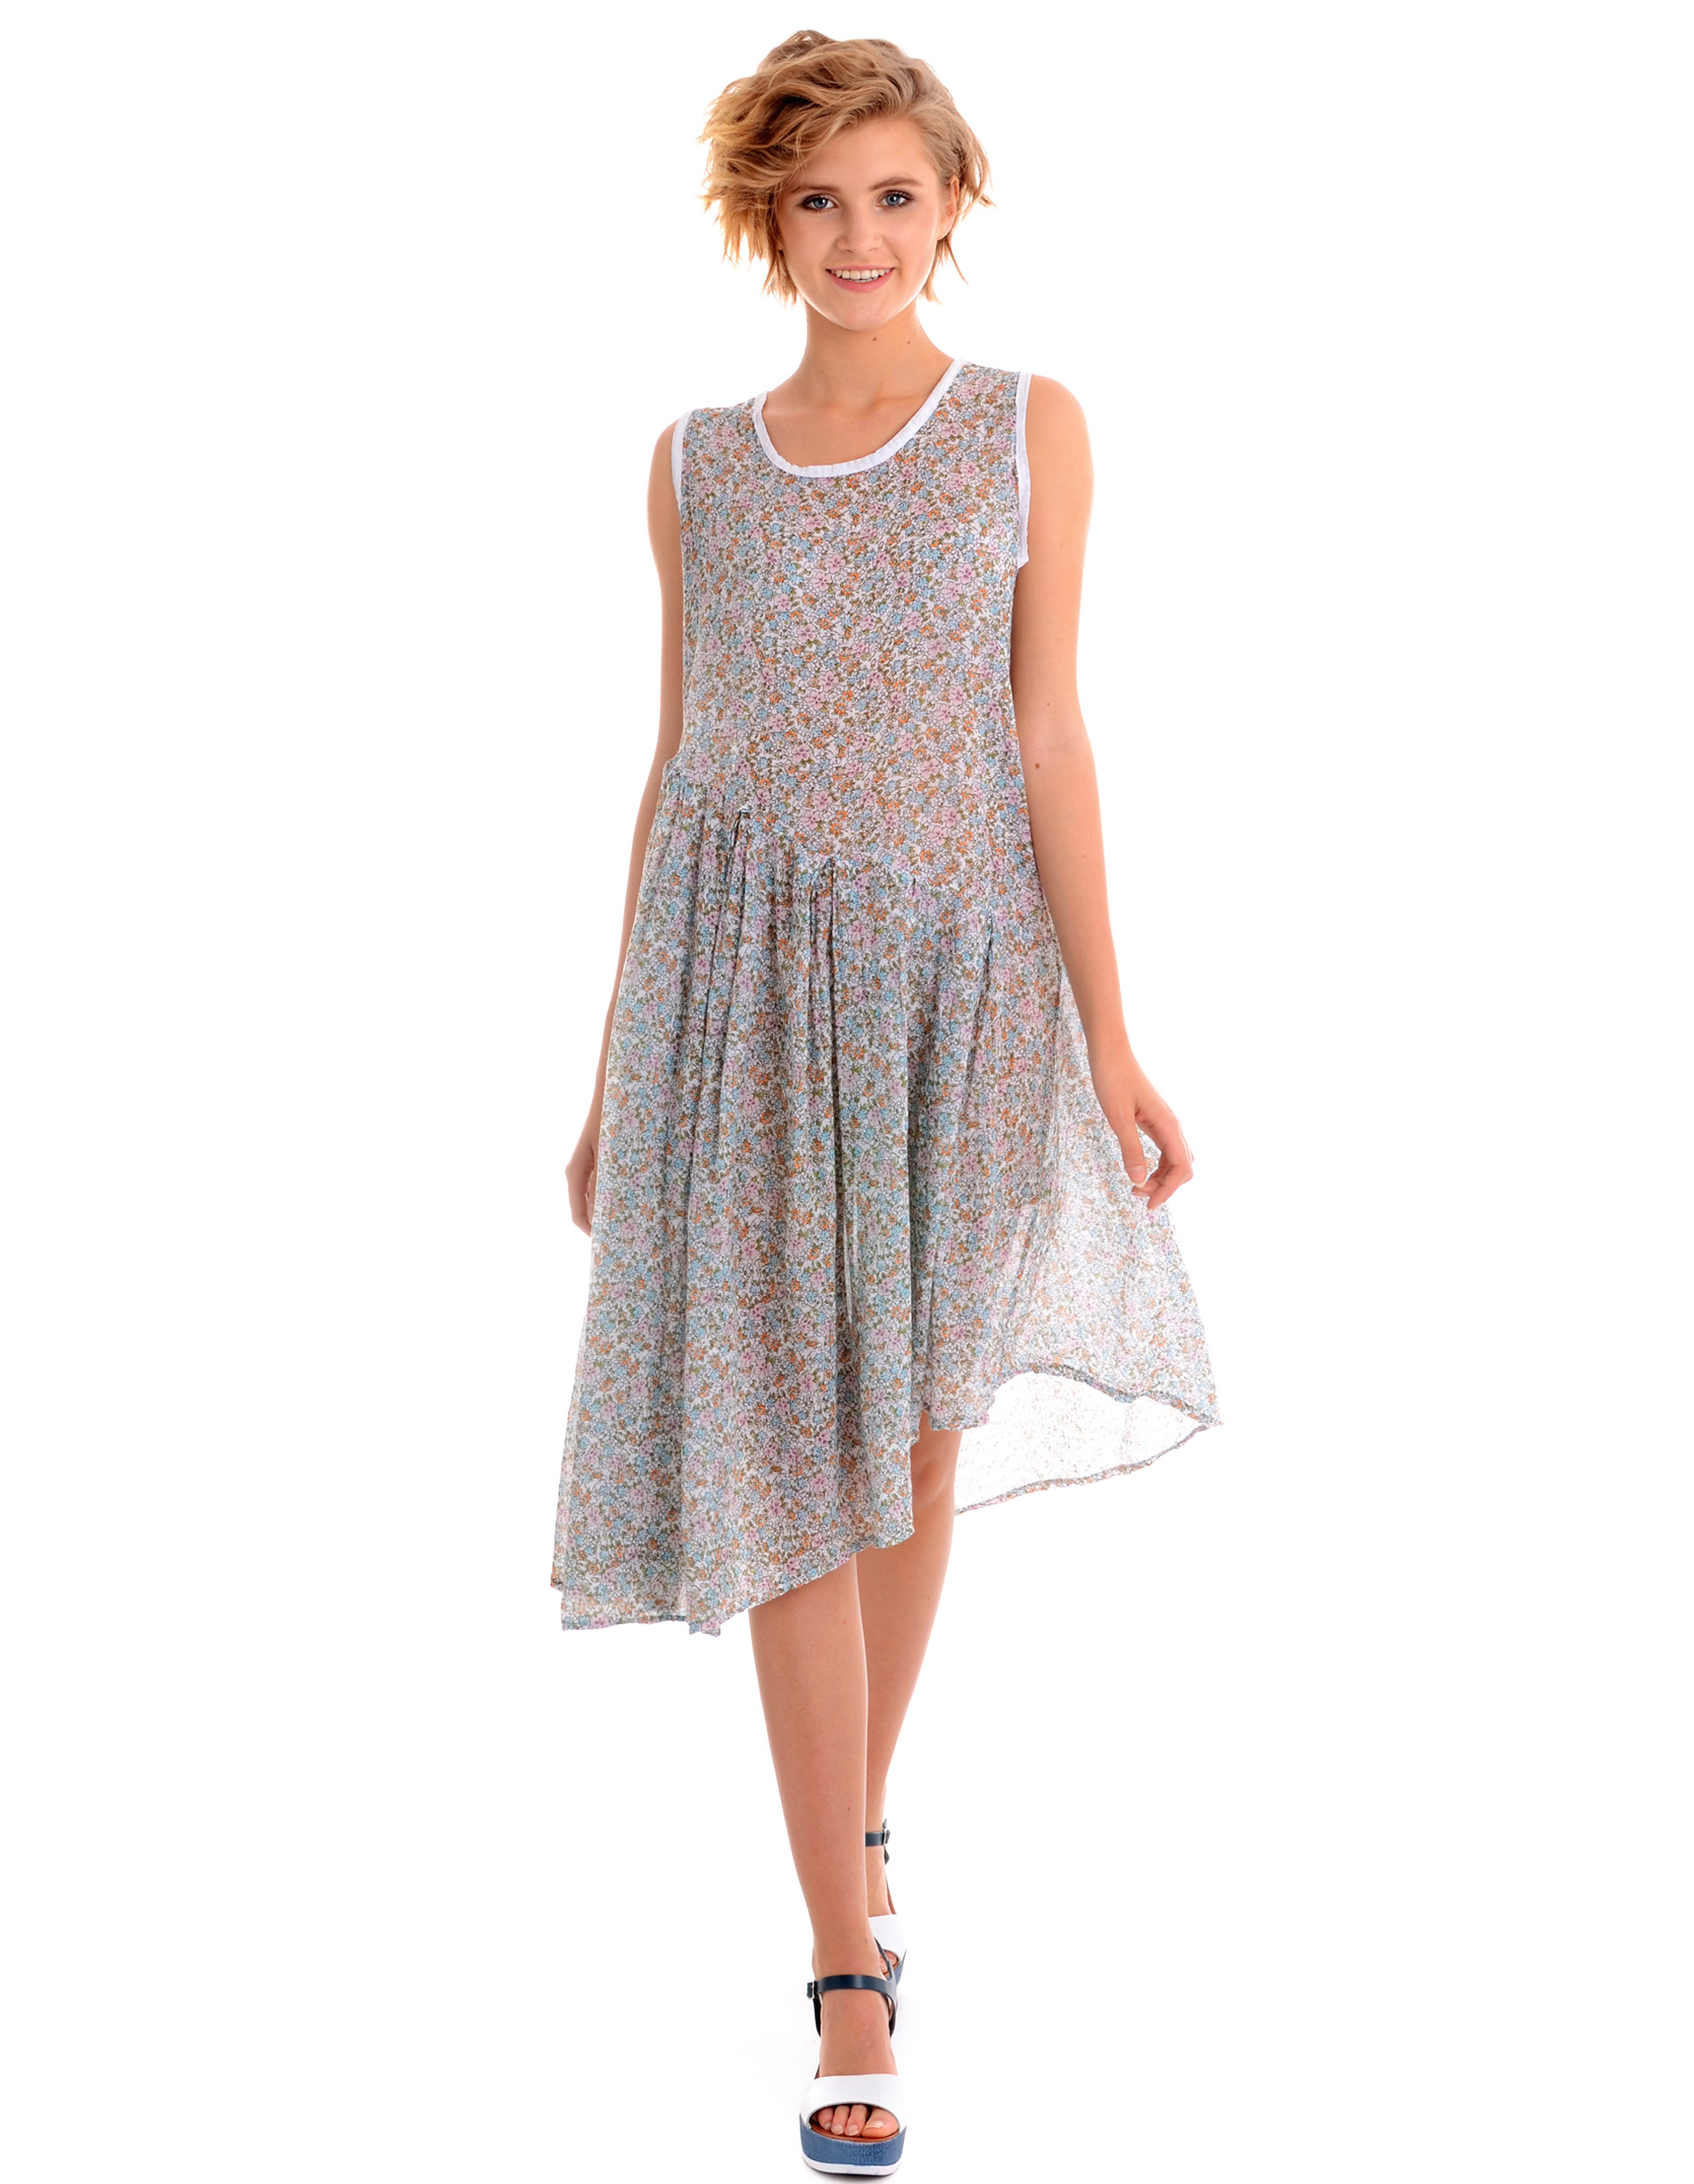 Sukienka - 16-3636 BIANC - Unisono